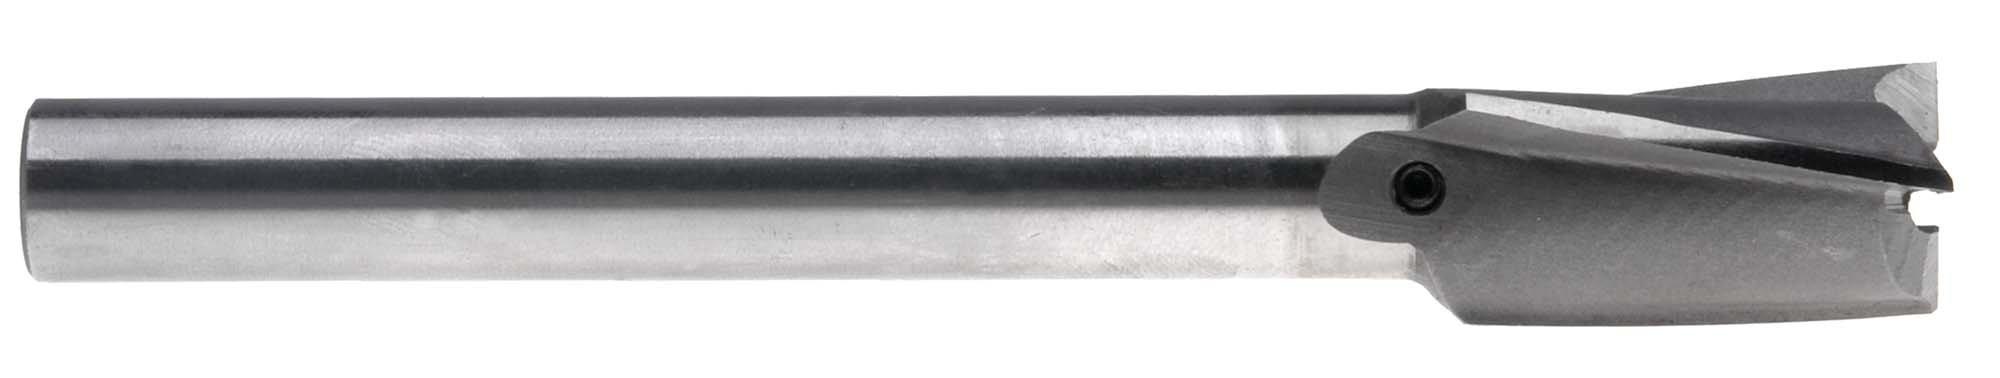 3/8'' Straight Shank Counterbore, Interchangeable Pilot Type, High Speed Steel